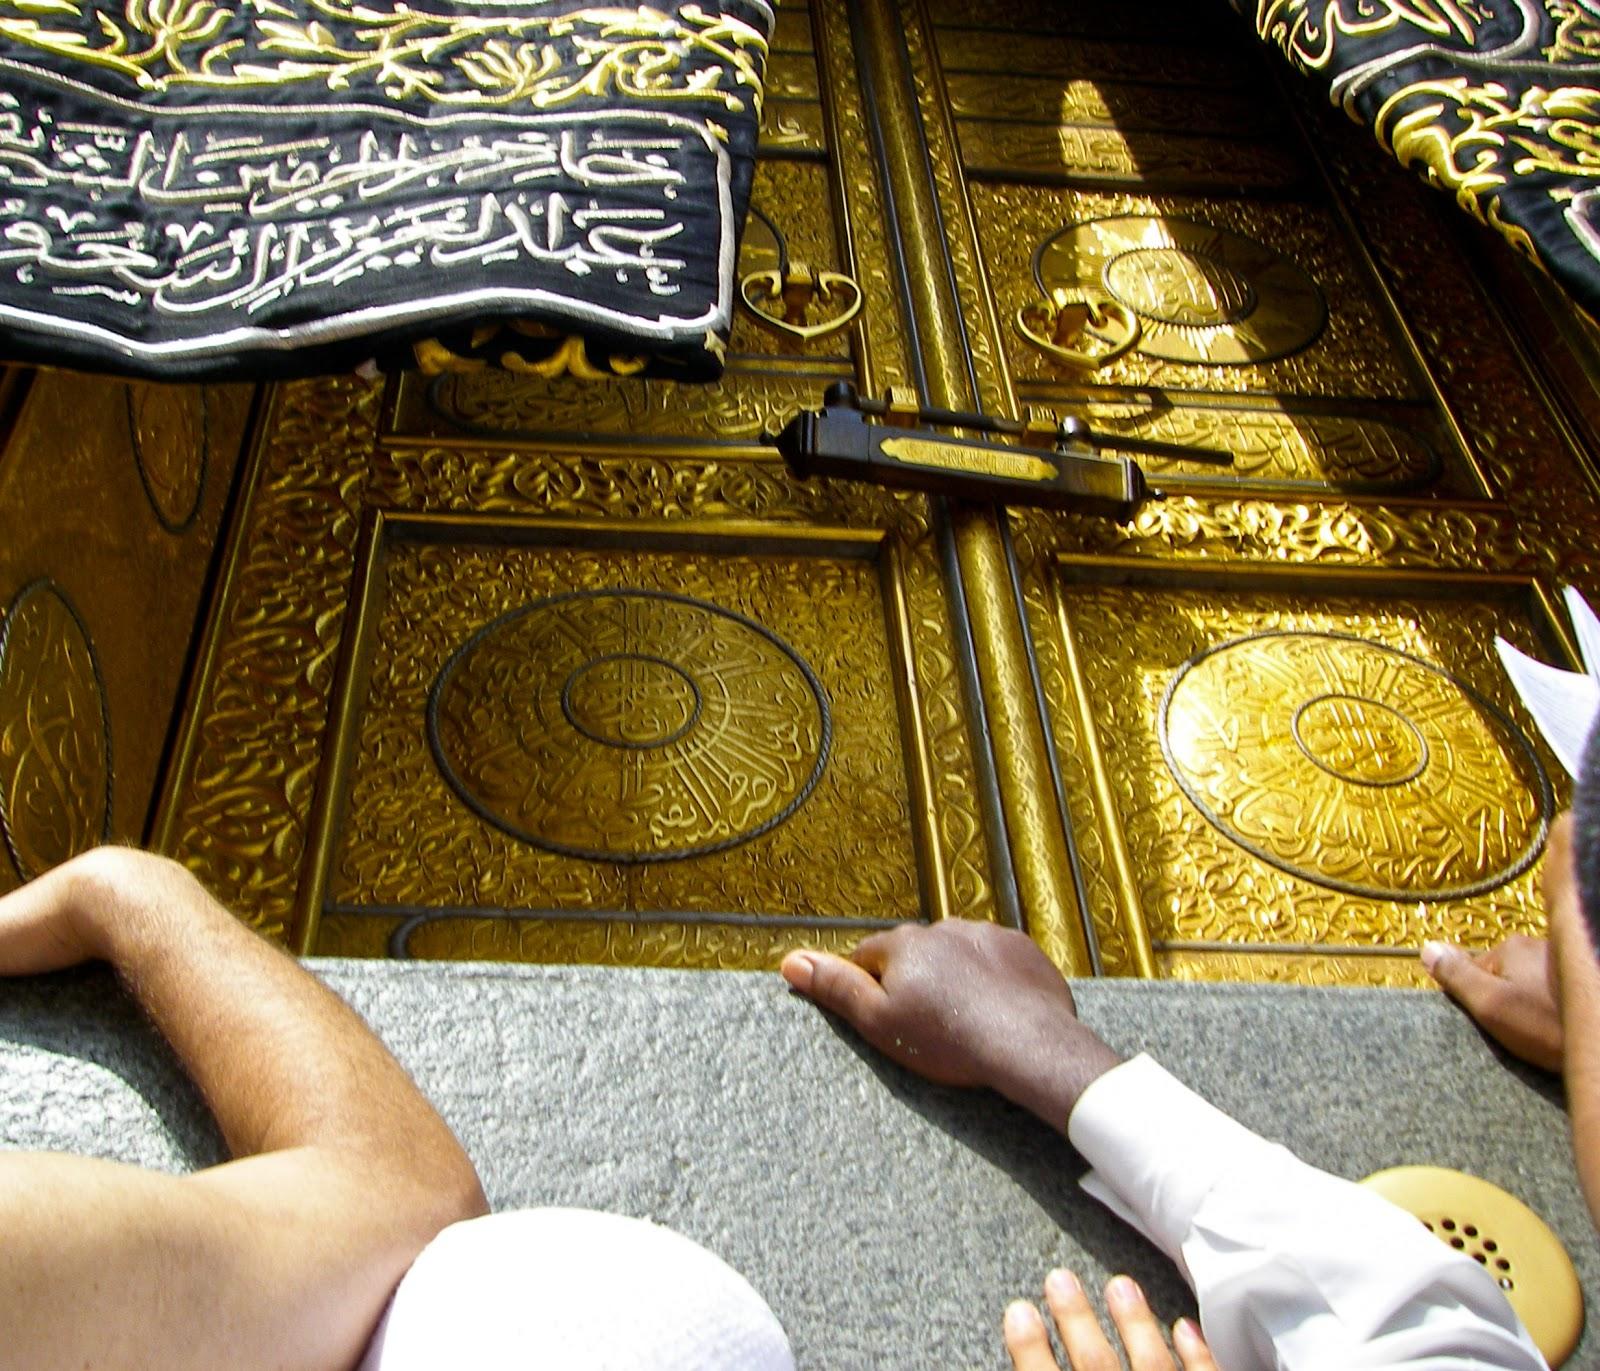 Masha Allah Hd Wallpaper Islamic Pictures Hd Image Of Door Of Kabba Mashallah